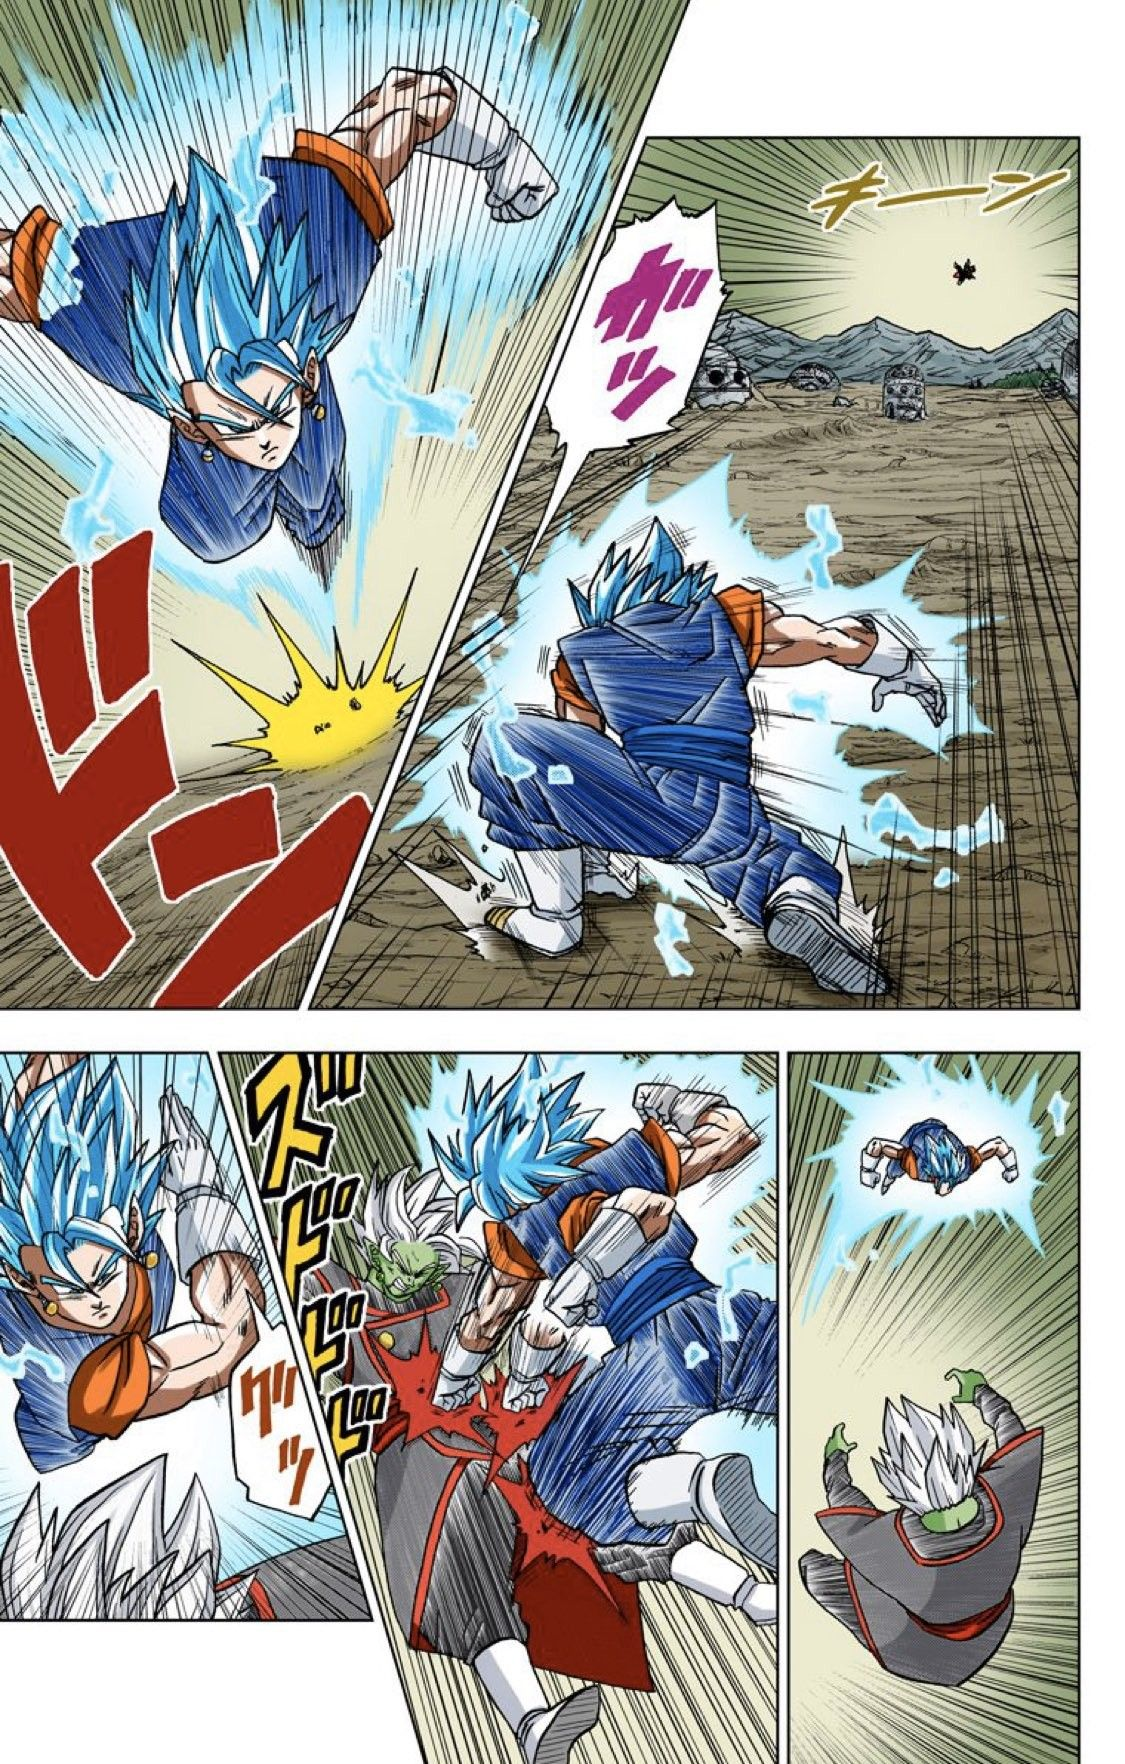 Vegito Vs Zamasu Dbs Manga Anime Dragon Ball Super Dragon Ball Art Anime Dragon Ball